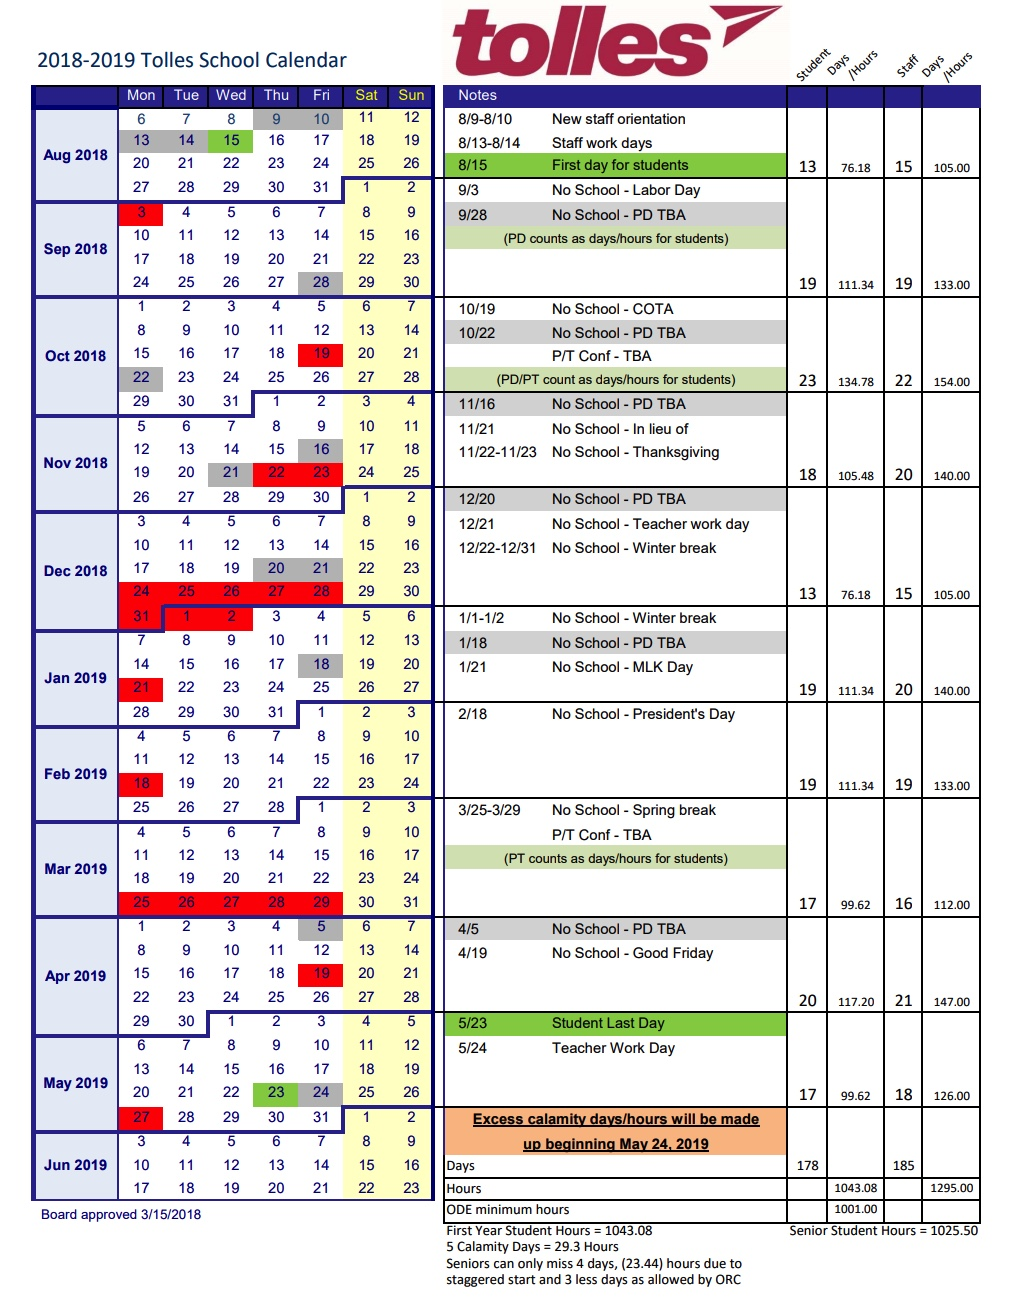 2019 District Calendar